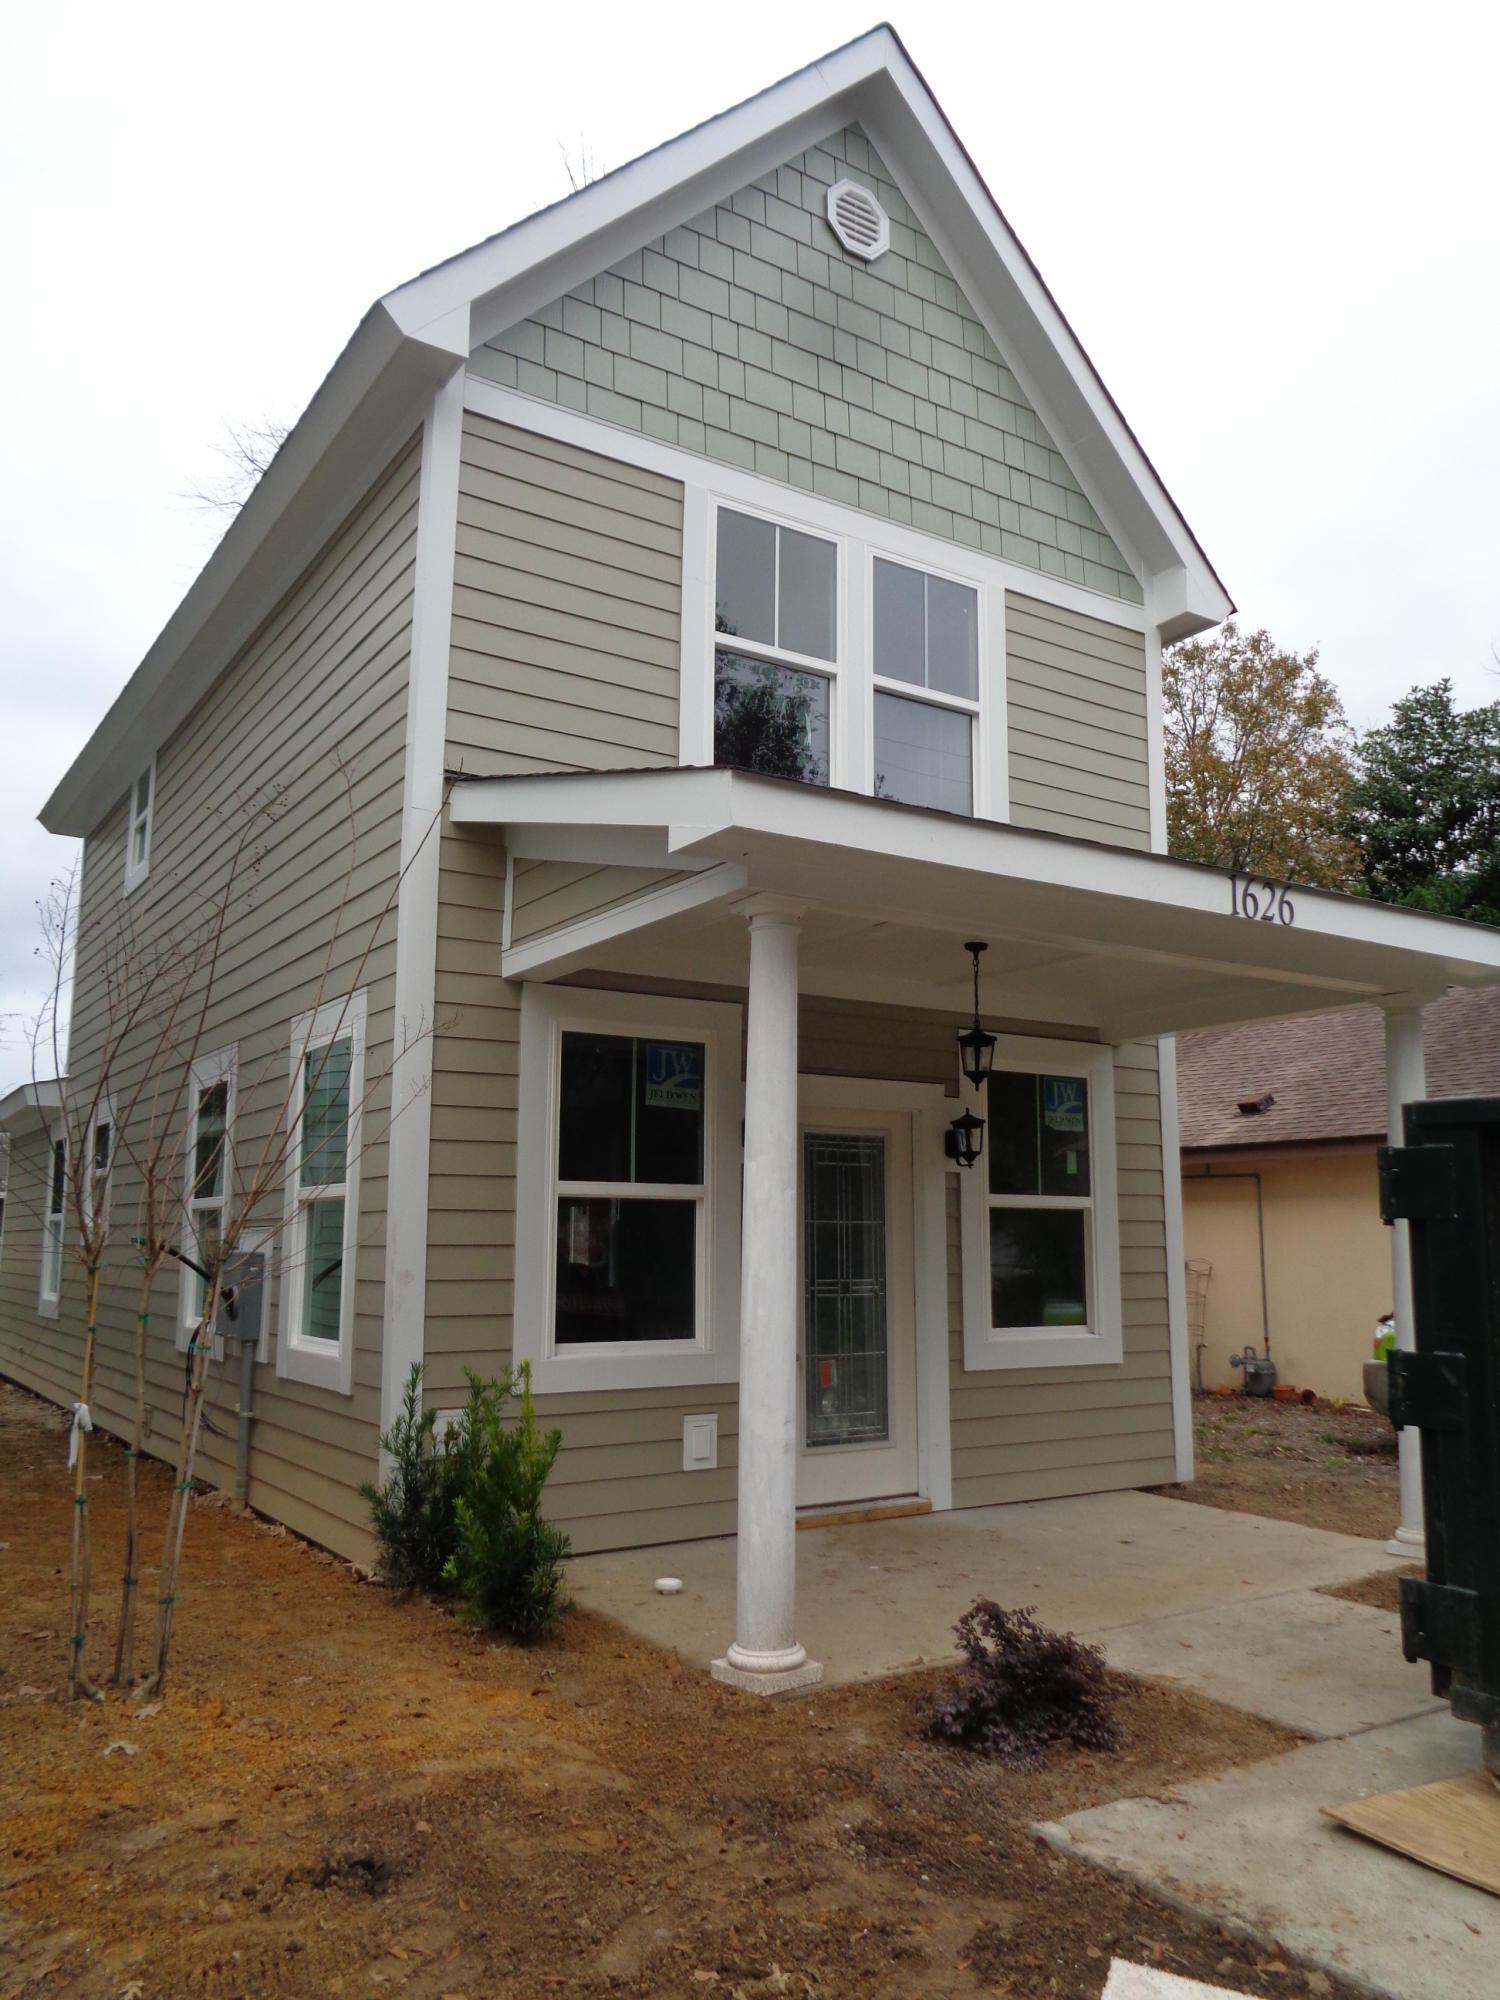 Pinecrest Gardens Homes For Sale - 1626 Wappoo, Charleston, SC - 42